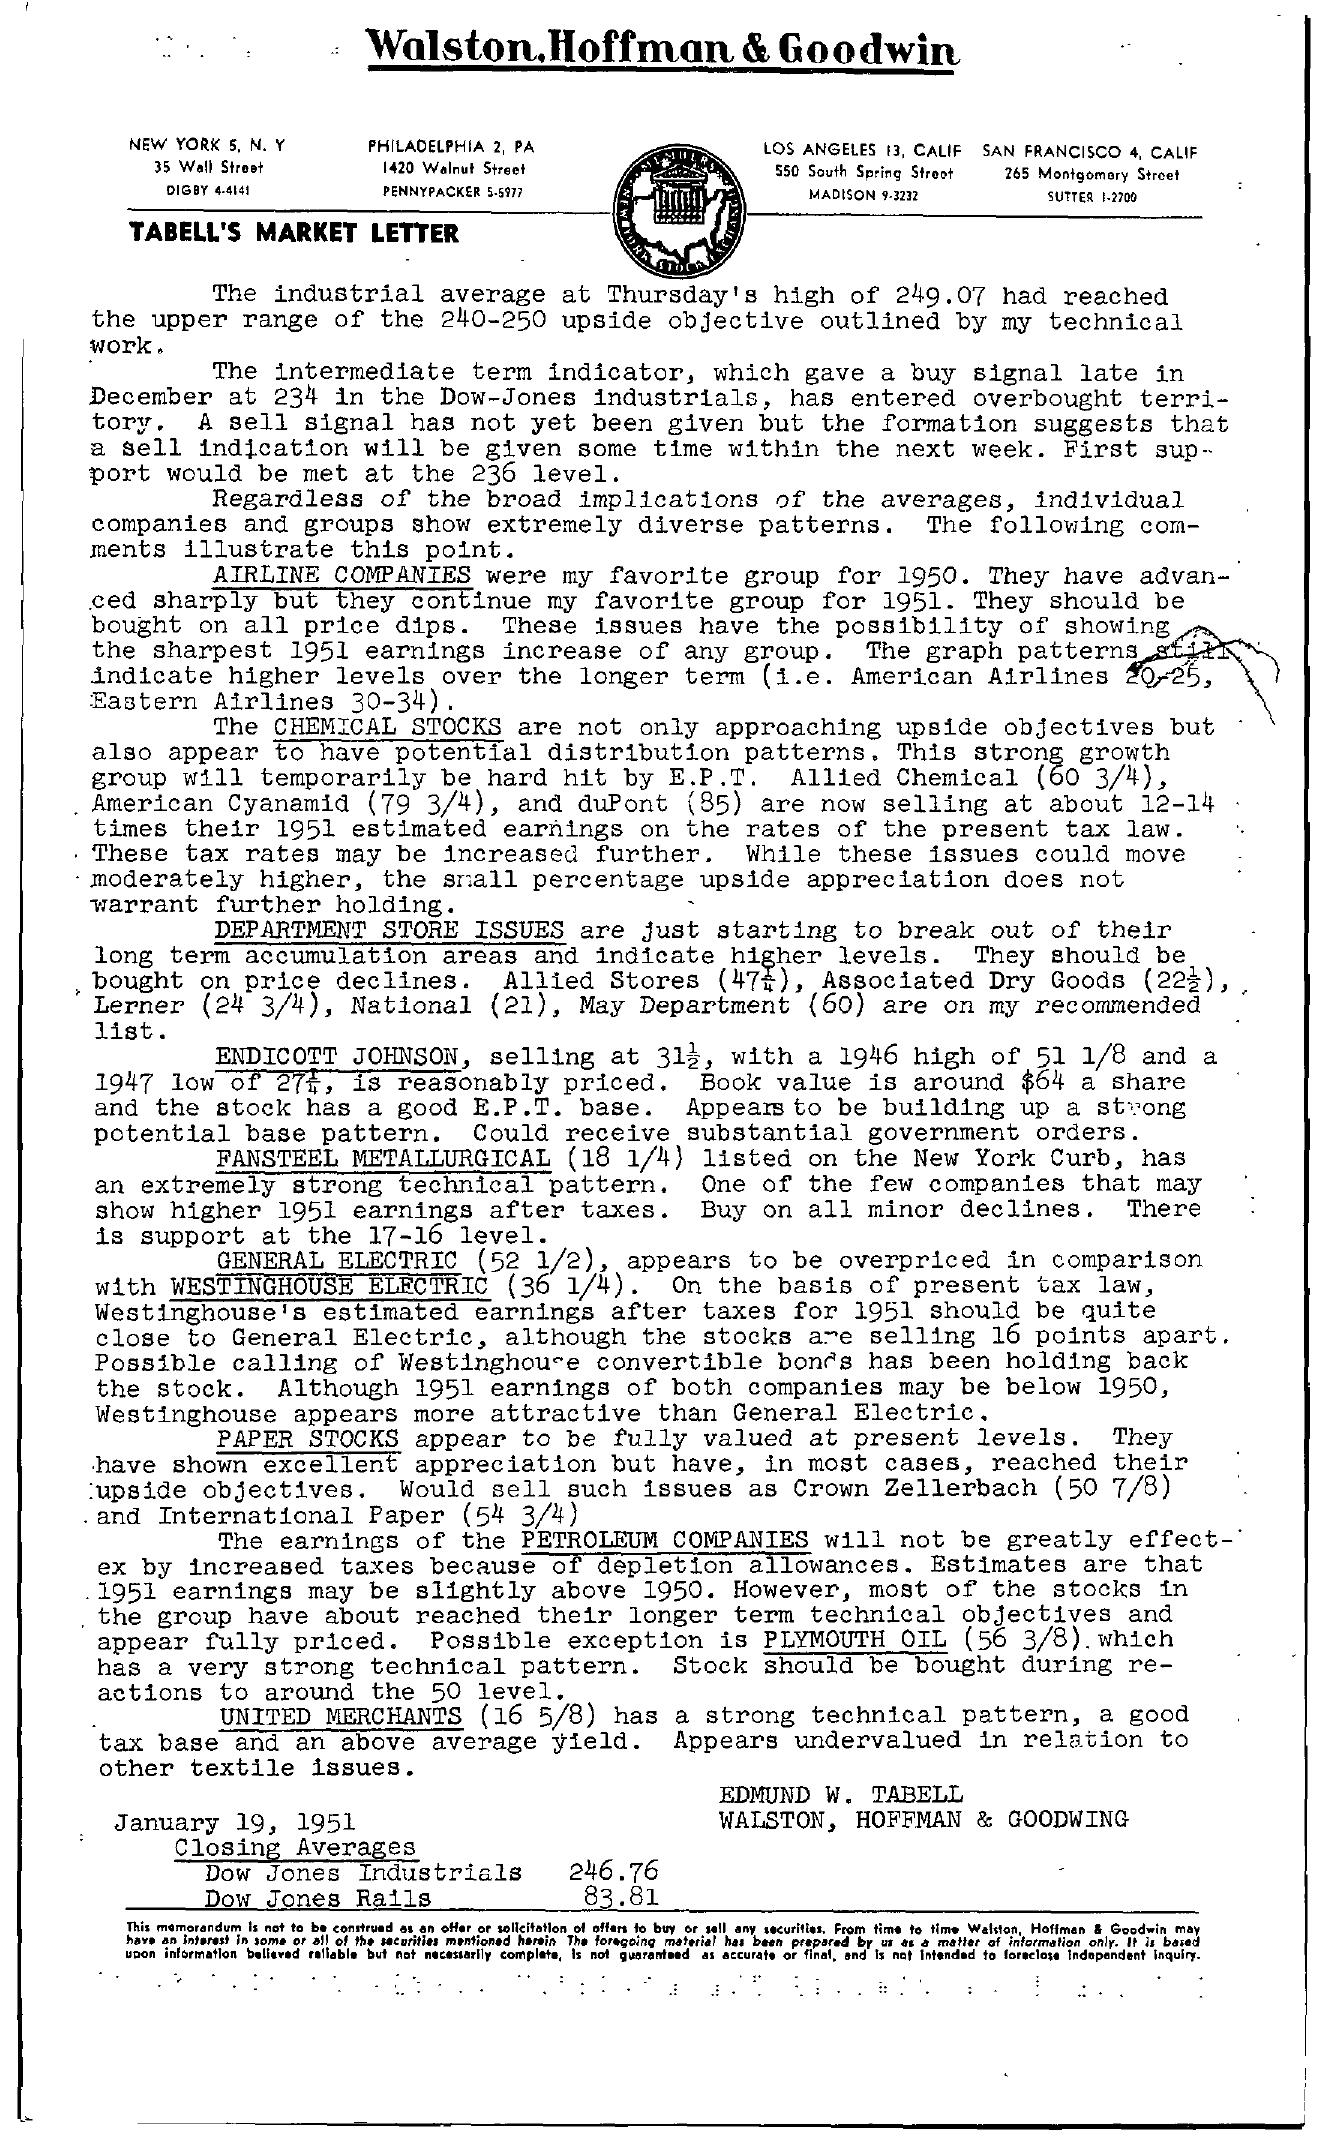 Tabell's Market Letter - January 19, 1951